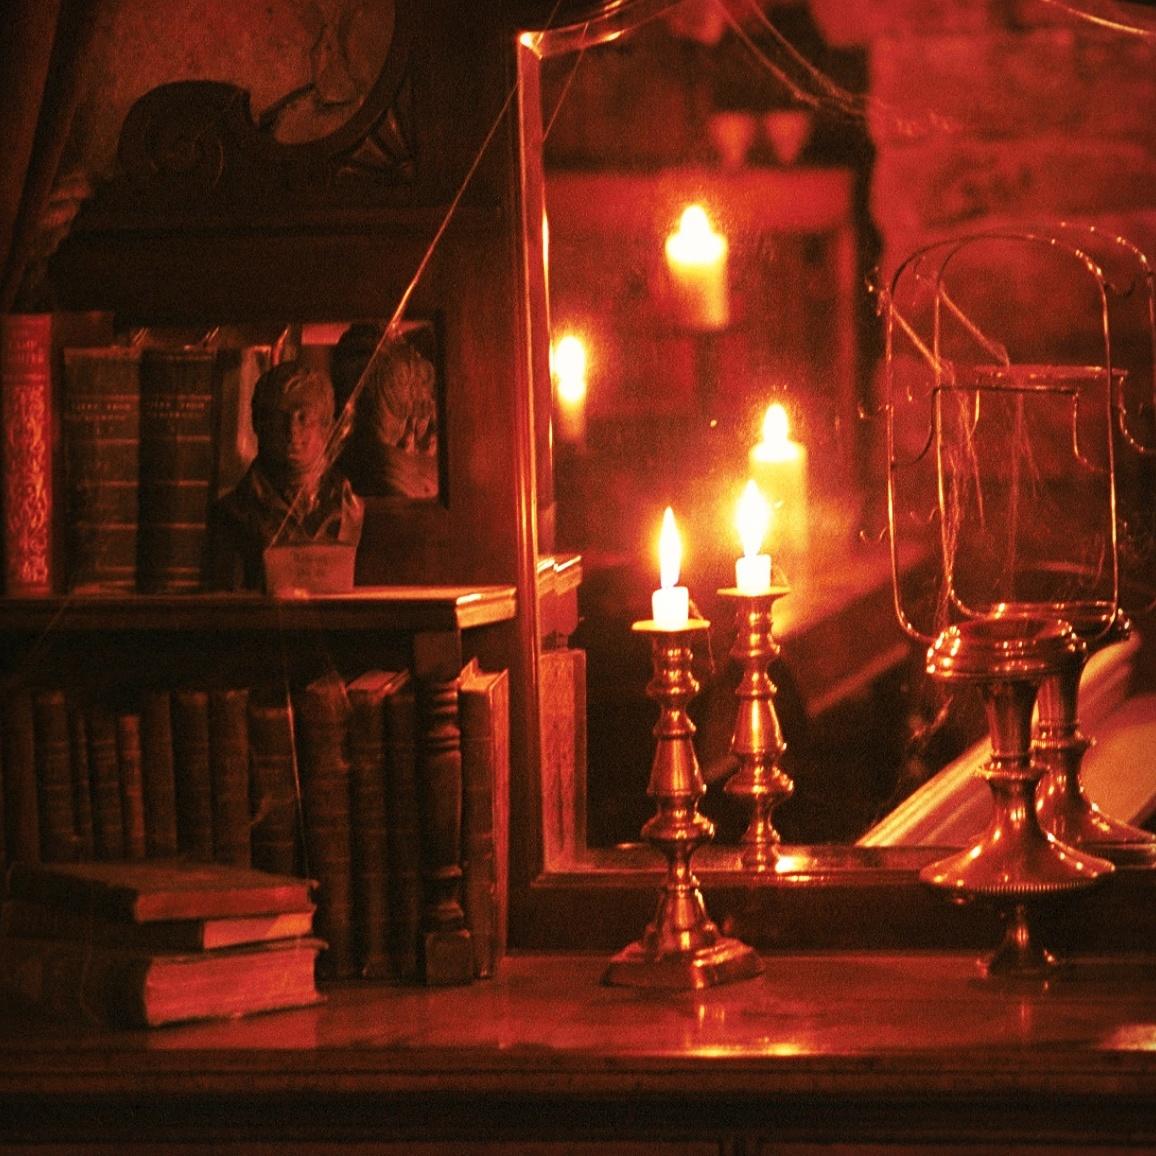 Edinburgh Tours: The Malice of Inanimate Objects